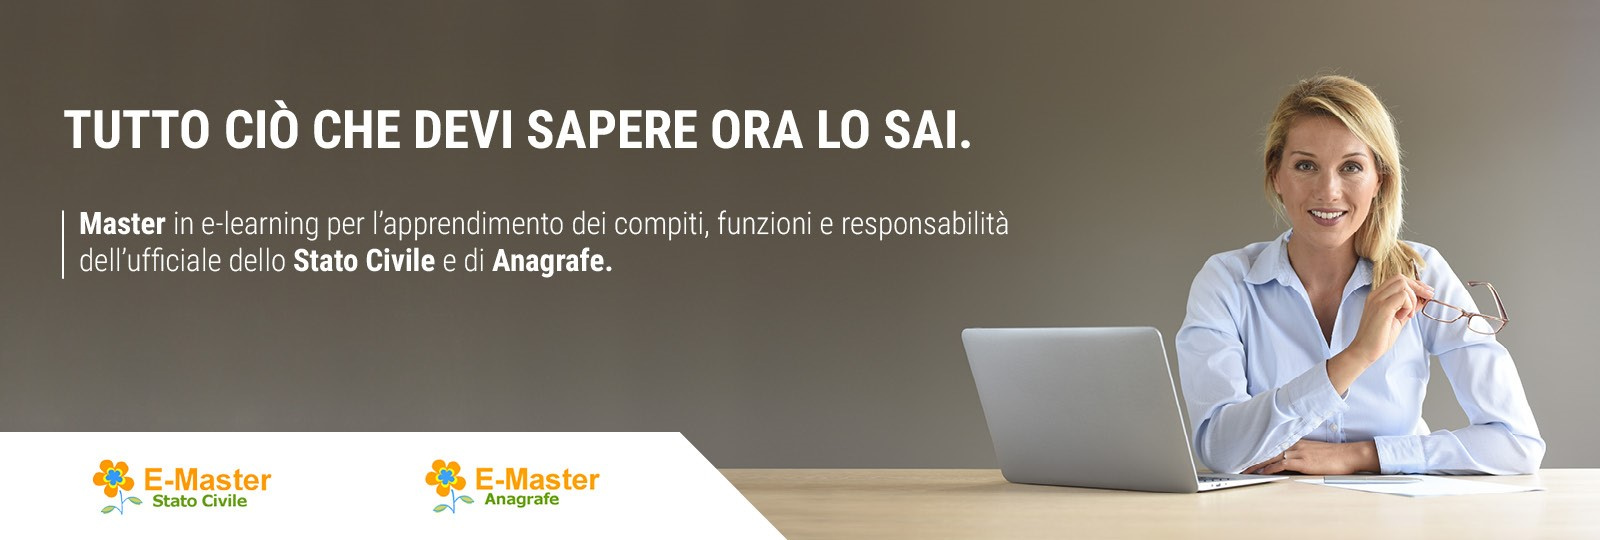 Master E-Learning